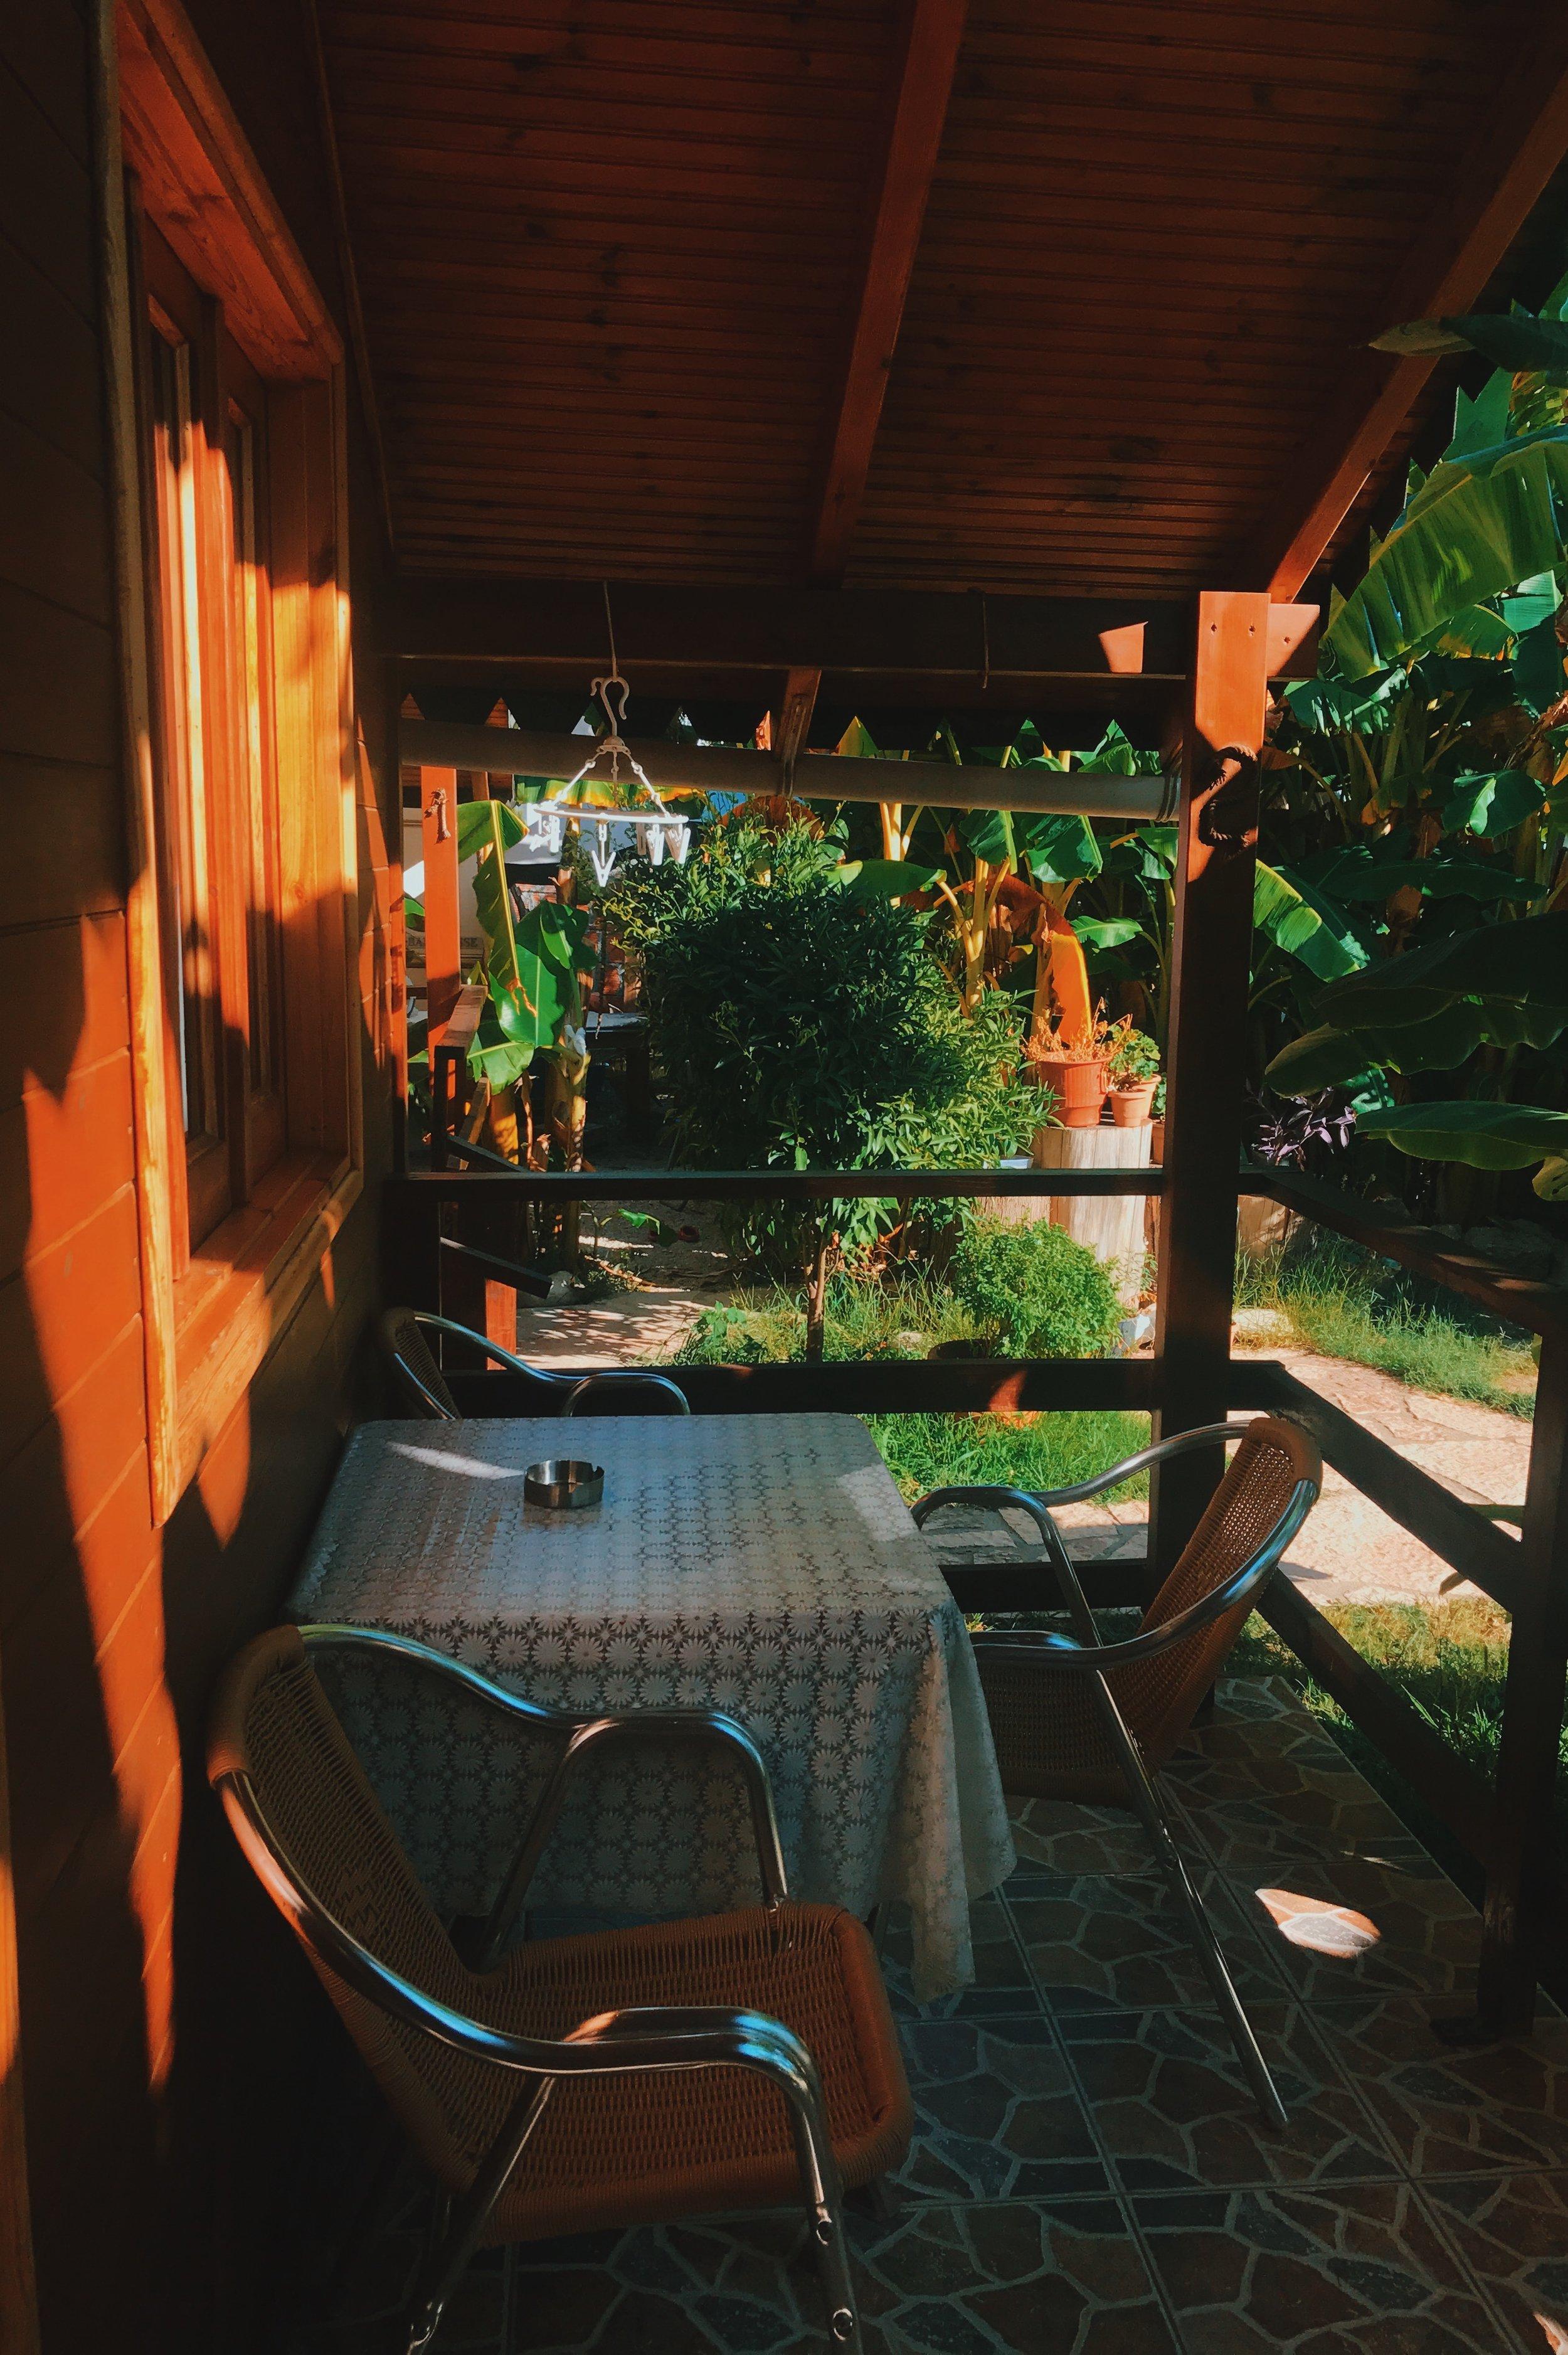 The Druri Dhermi Guesthouse in Albania